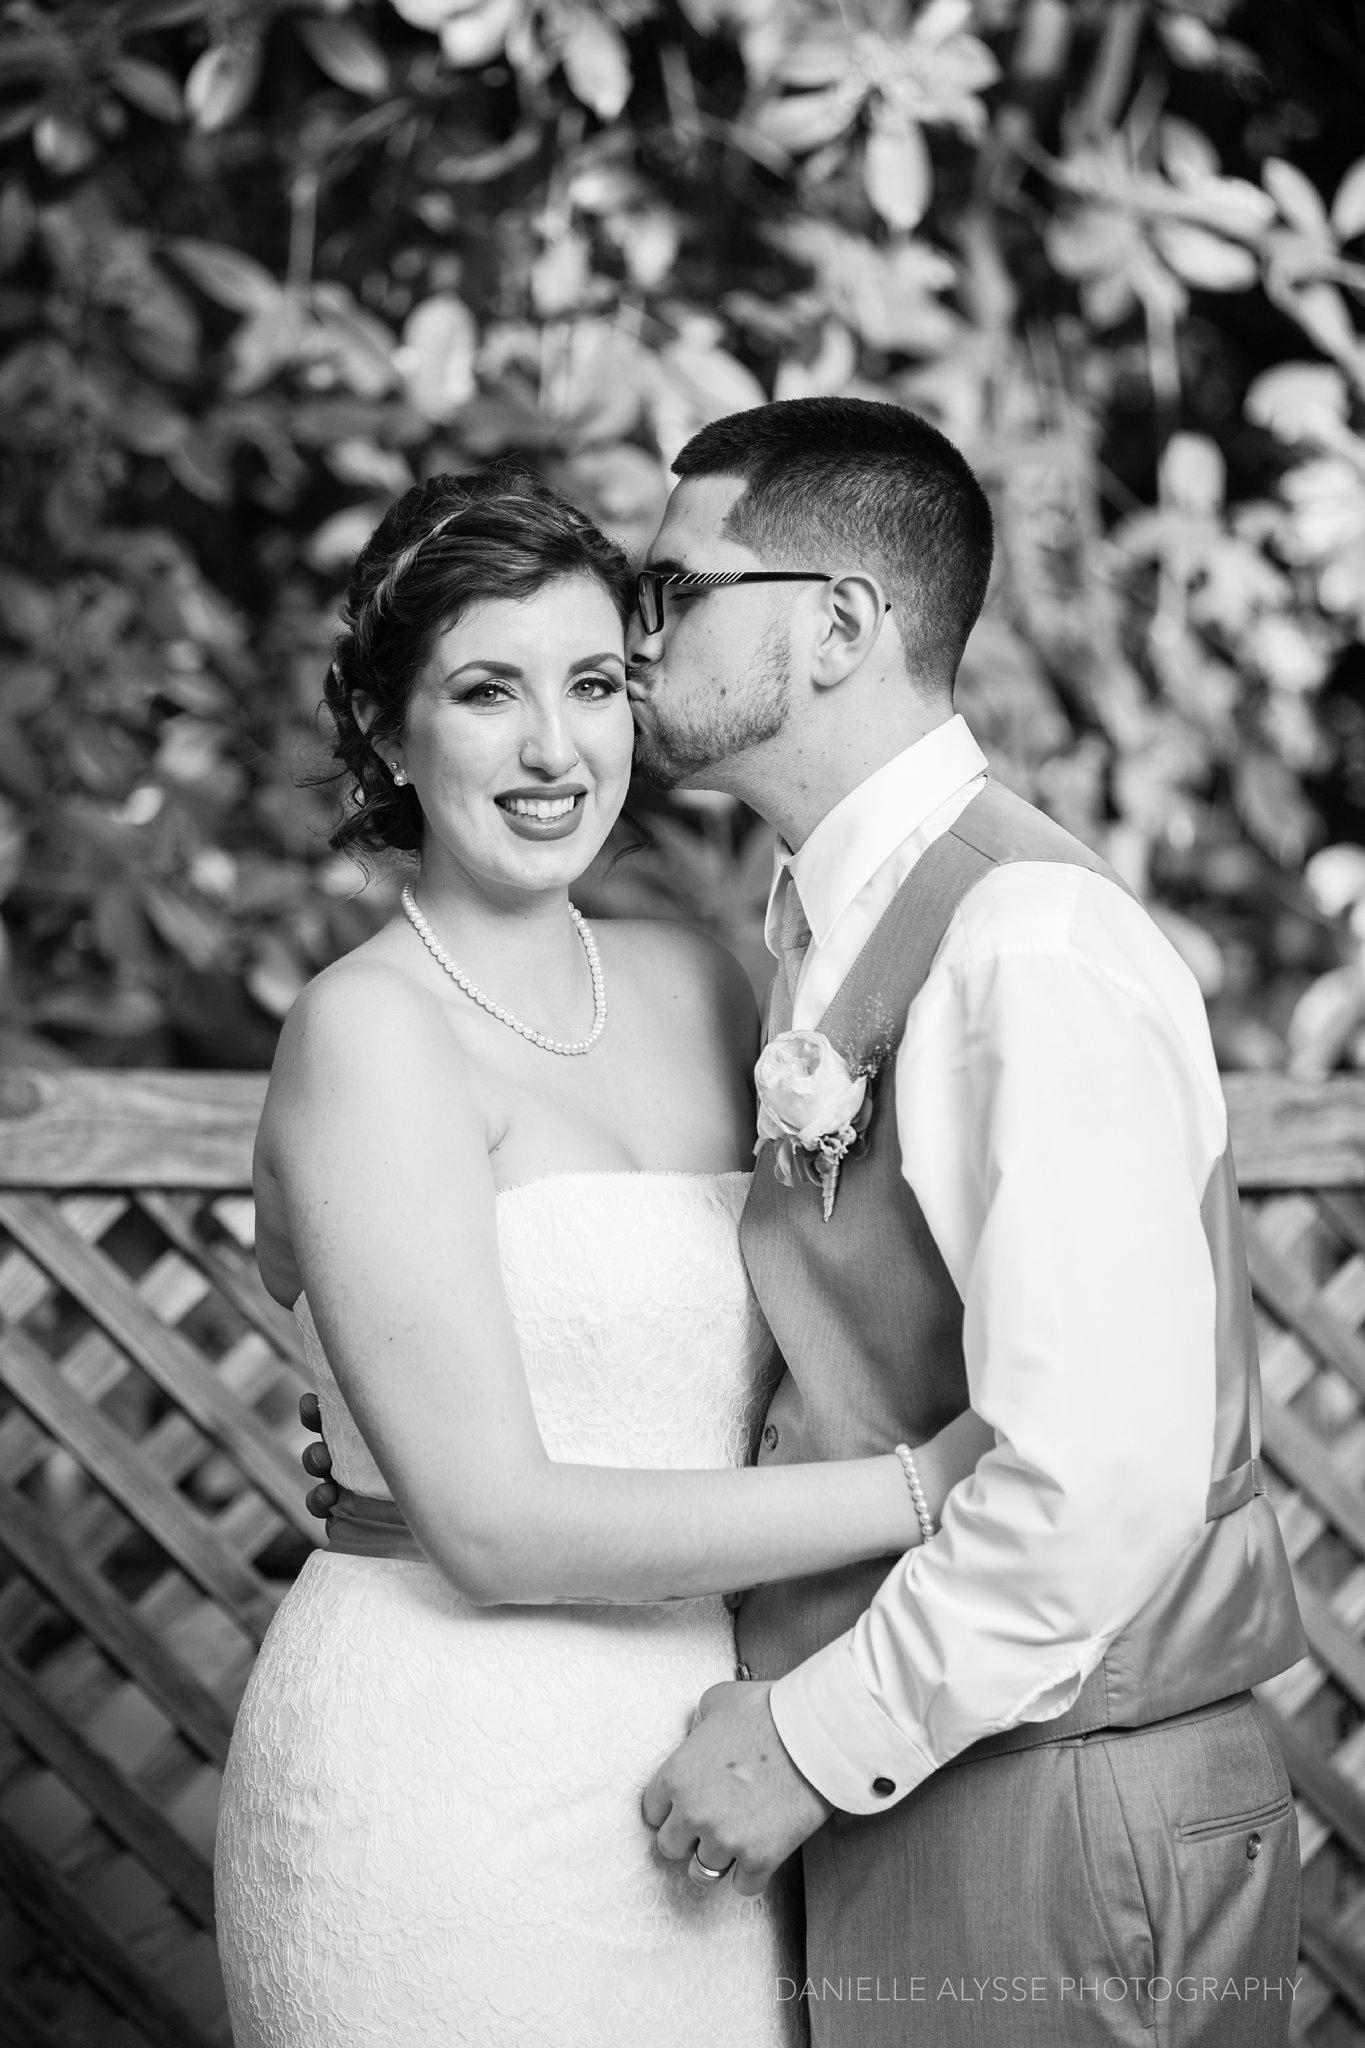 170507_blog_megan_david_wedding_loomis_flower_farm_inn_danielle_alysse_photography_sacramento_photographer0402_WEB.jpg